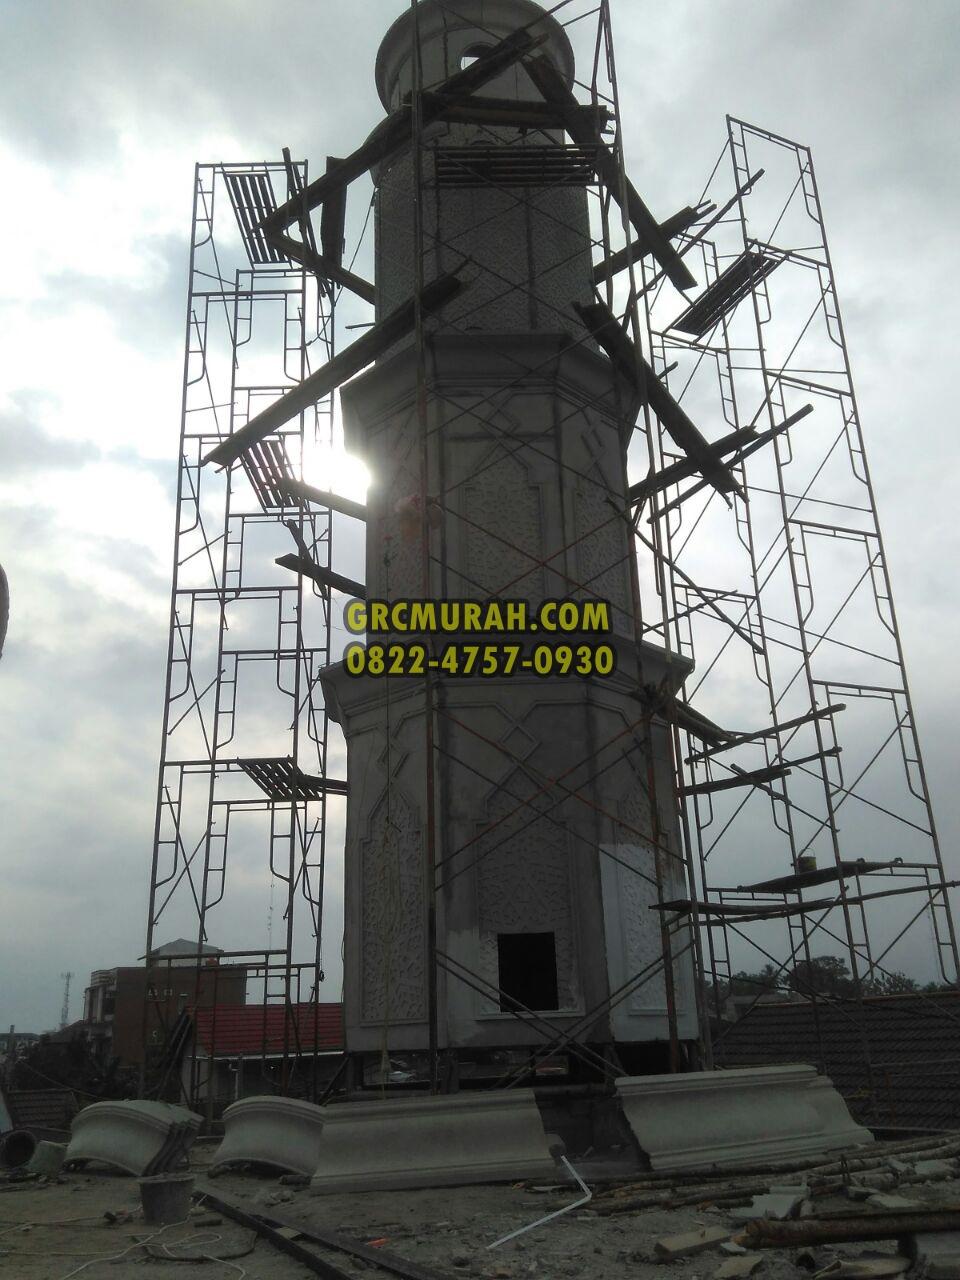 Menara Masjid GRC 06 - Berapa Harga Menara Masjid GRC